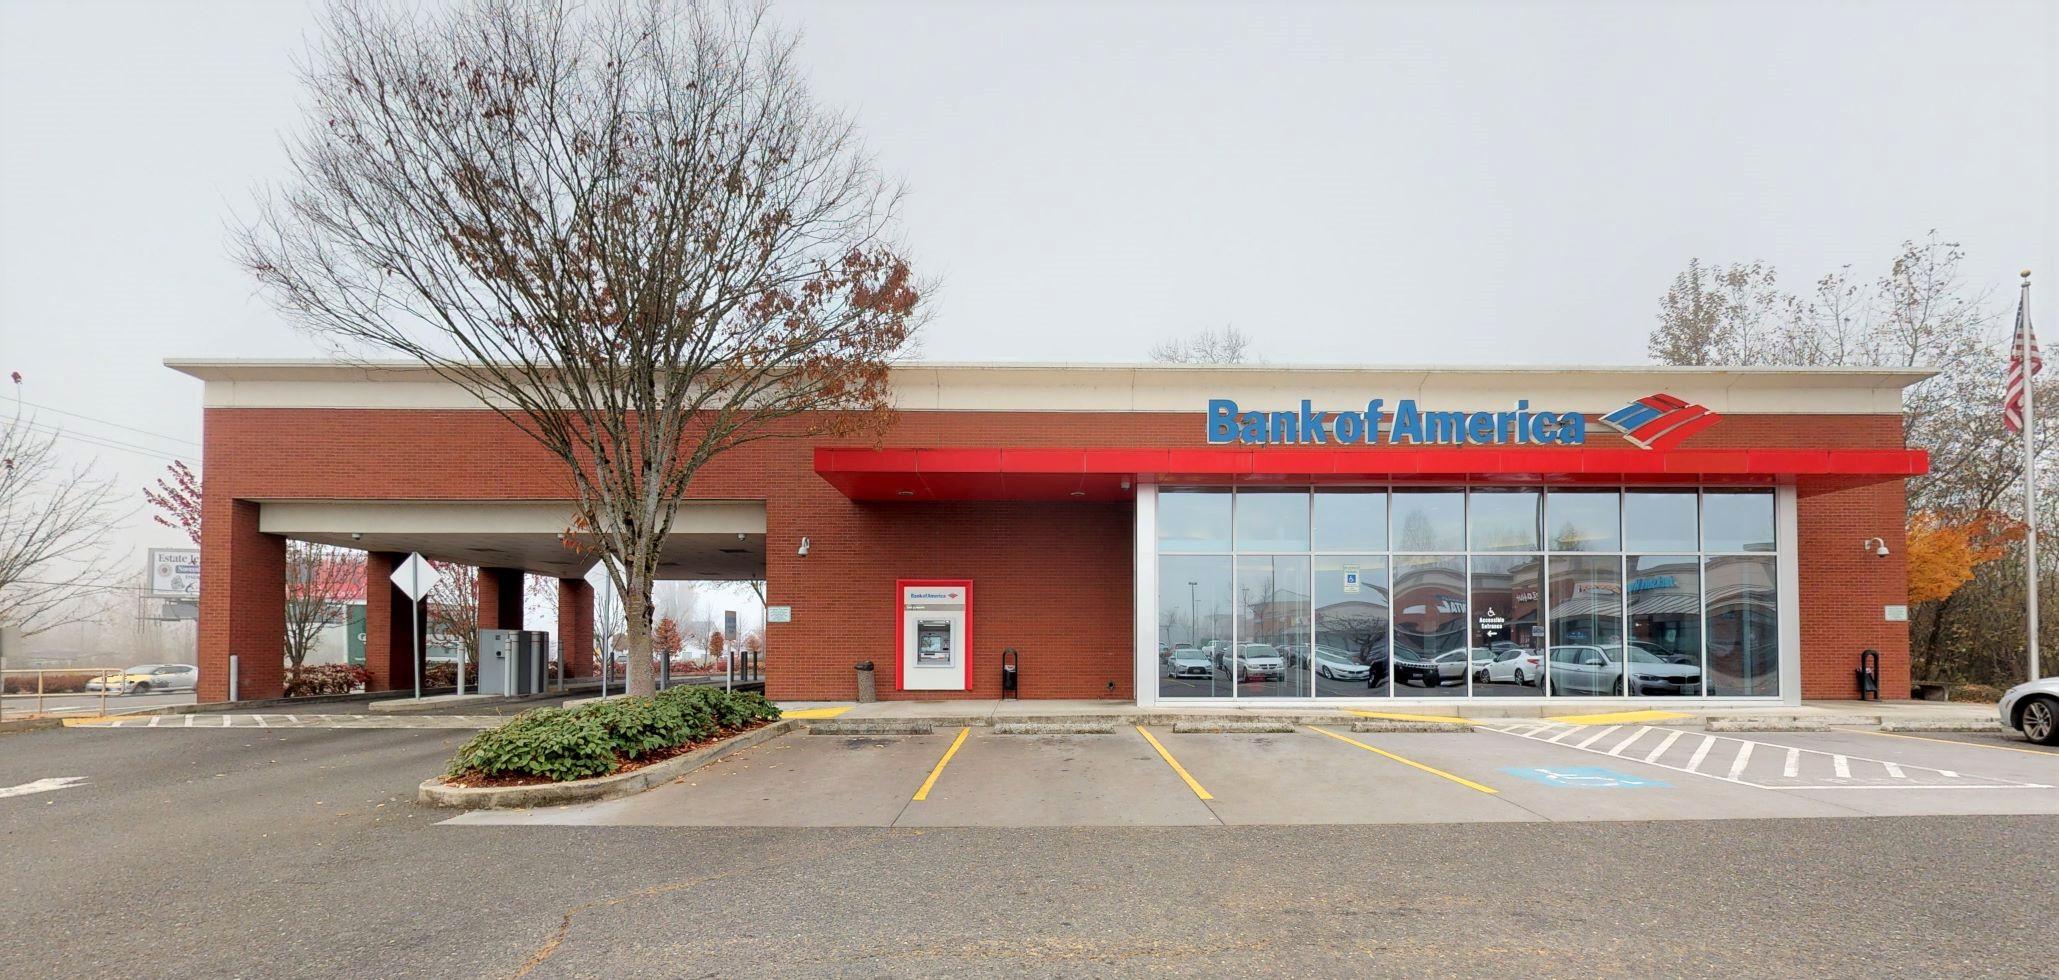 Bank of America financial center with drive-thru ATM | 2500 W Main St, Battle Ground, WA 98604